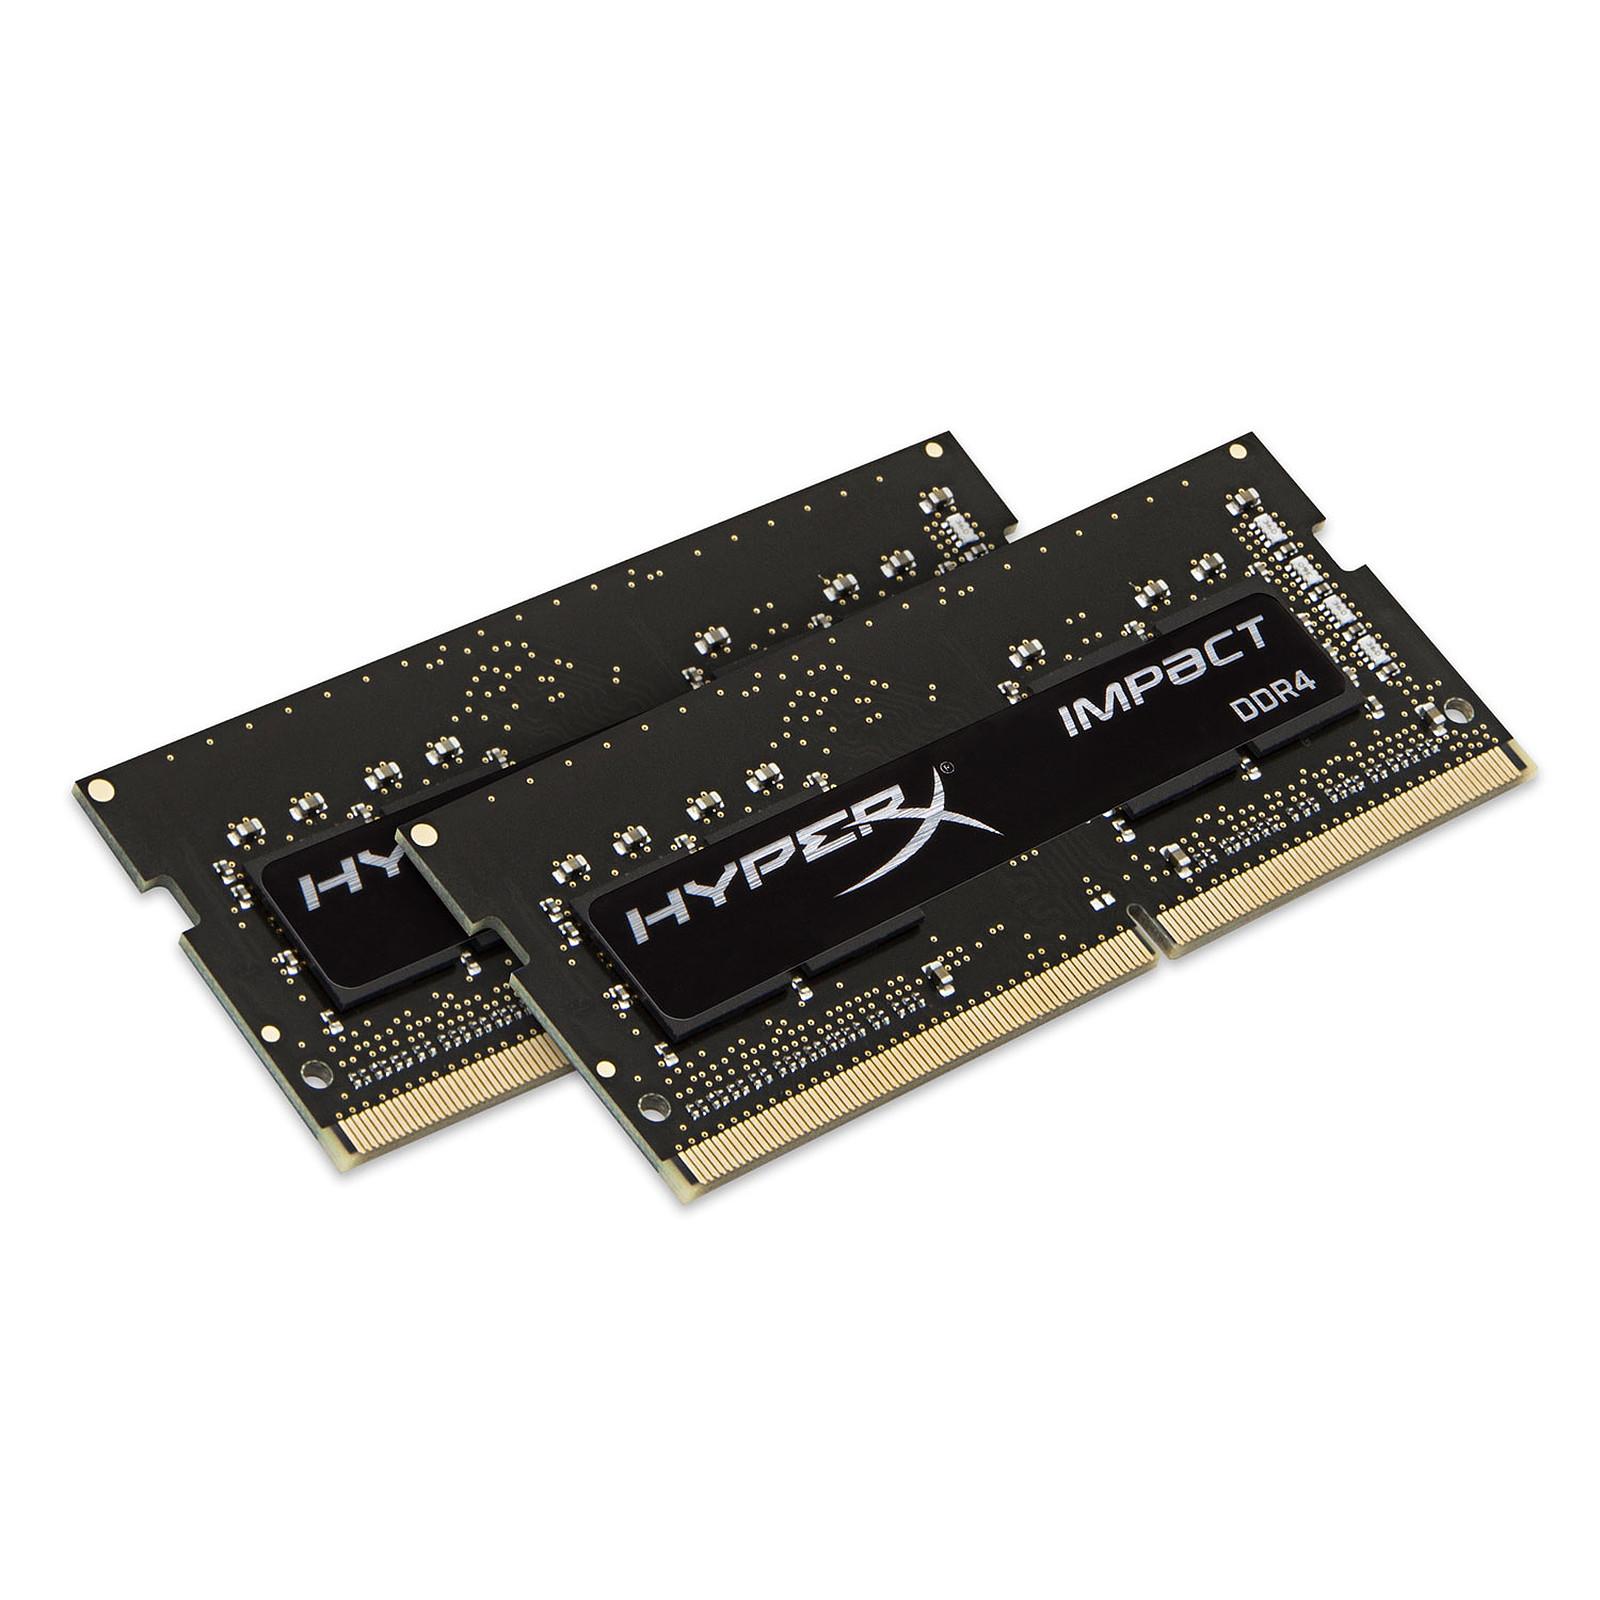 HyperX Impact SO-DIMM 16 Go (2 x 8 Go) DDR4 2400 MHz CL14